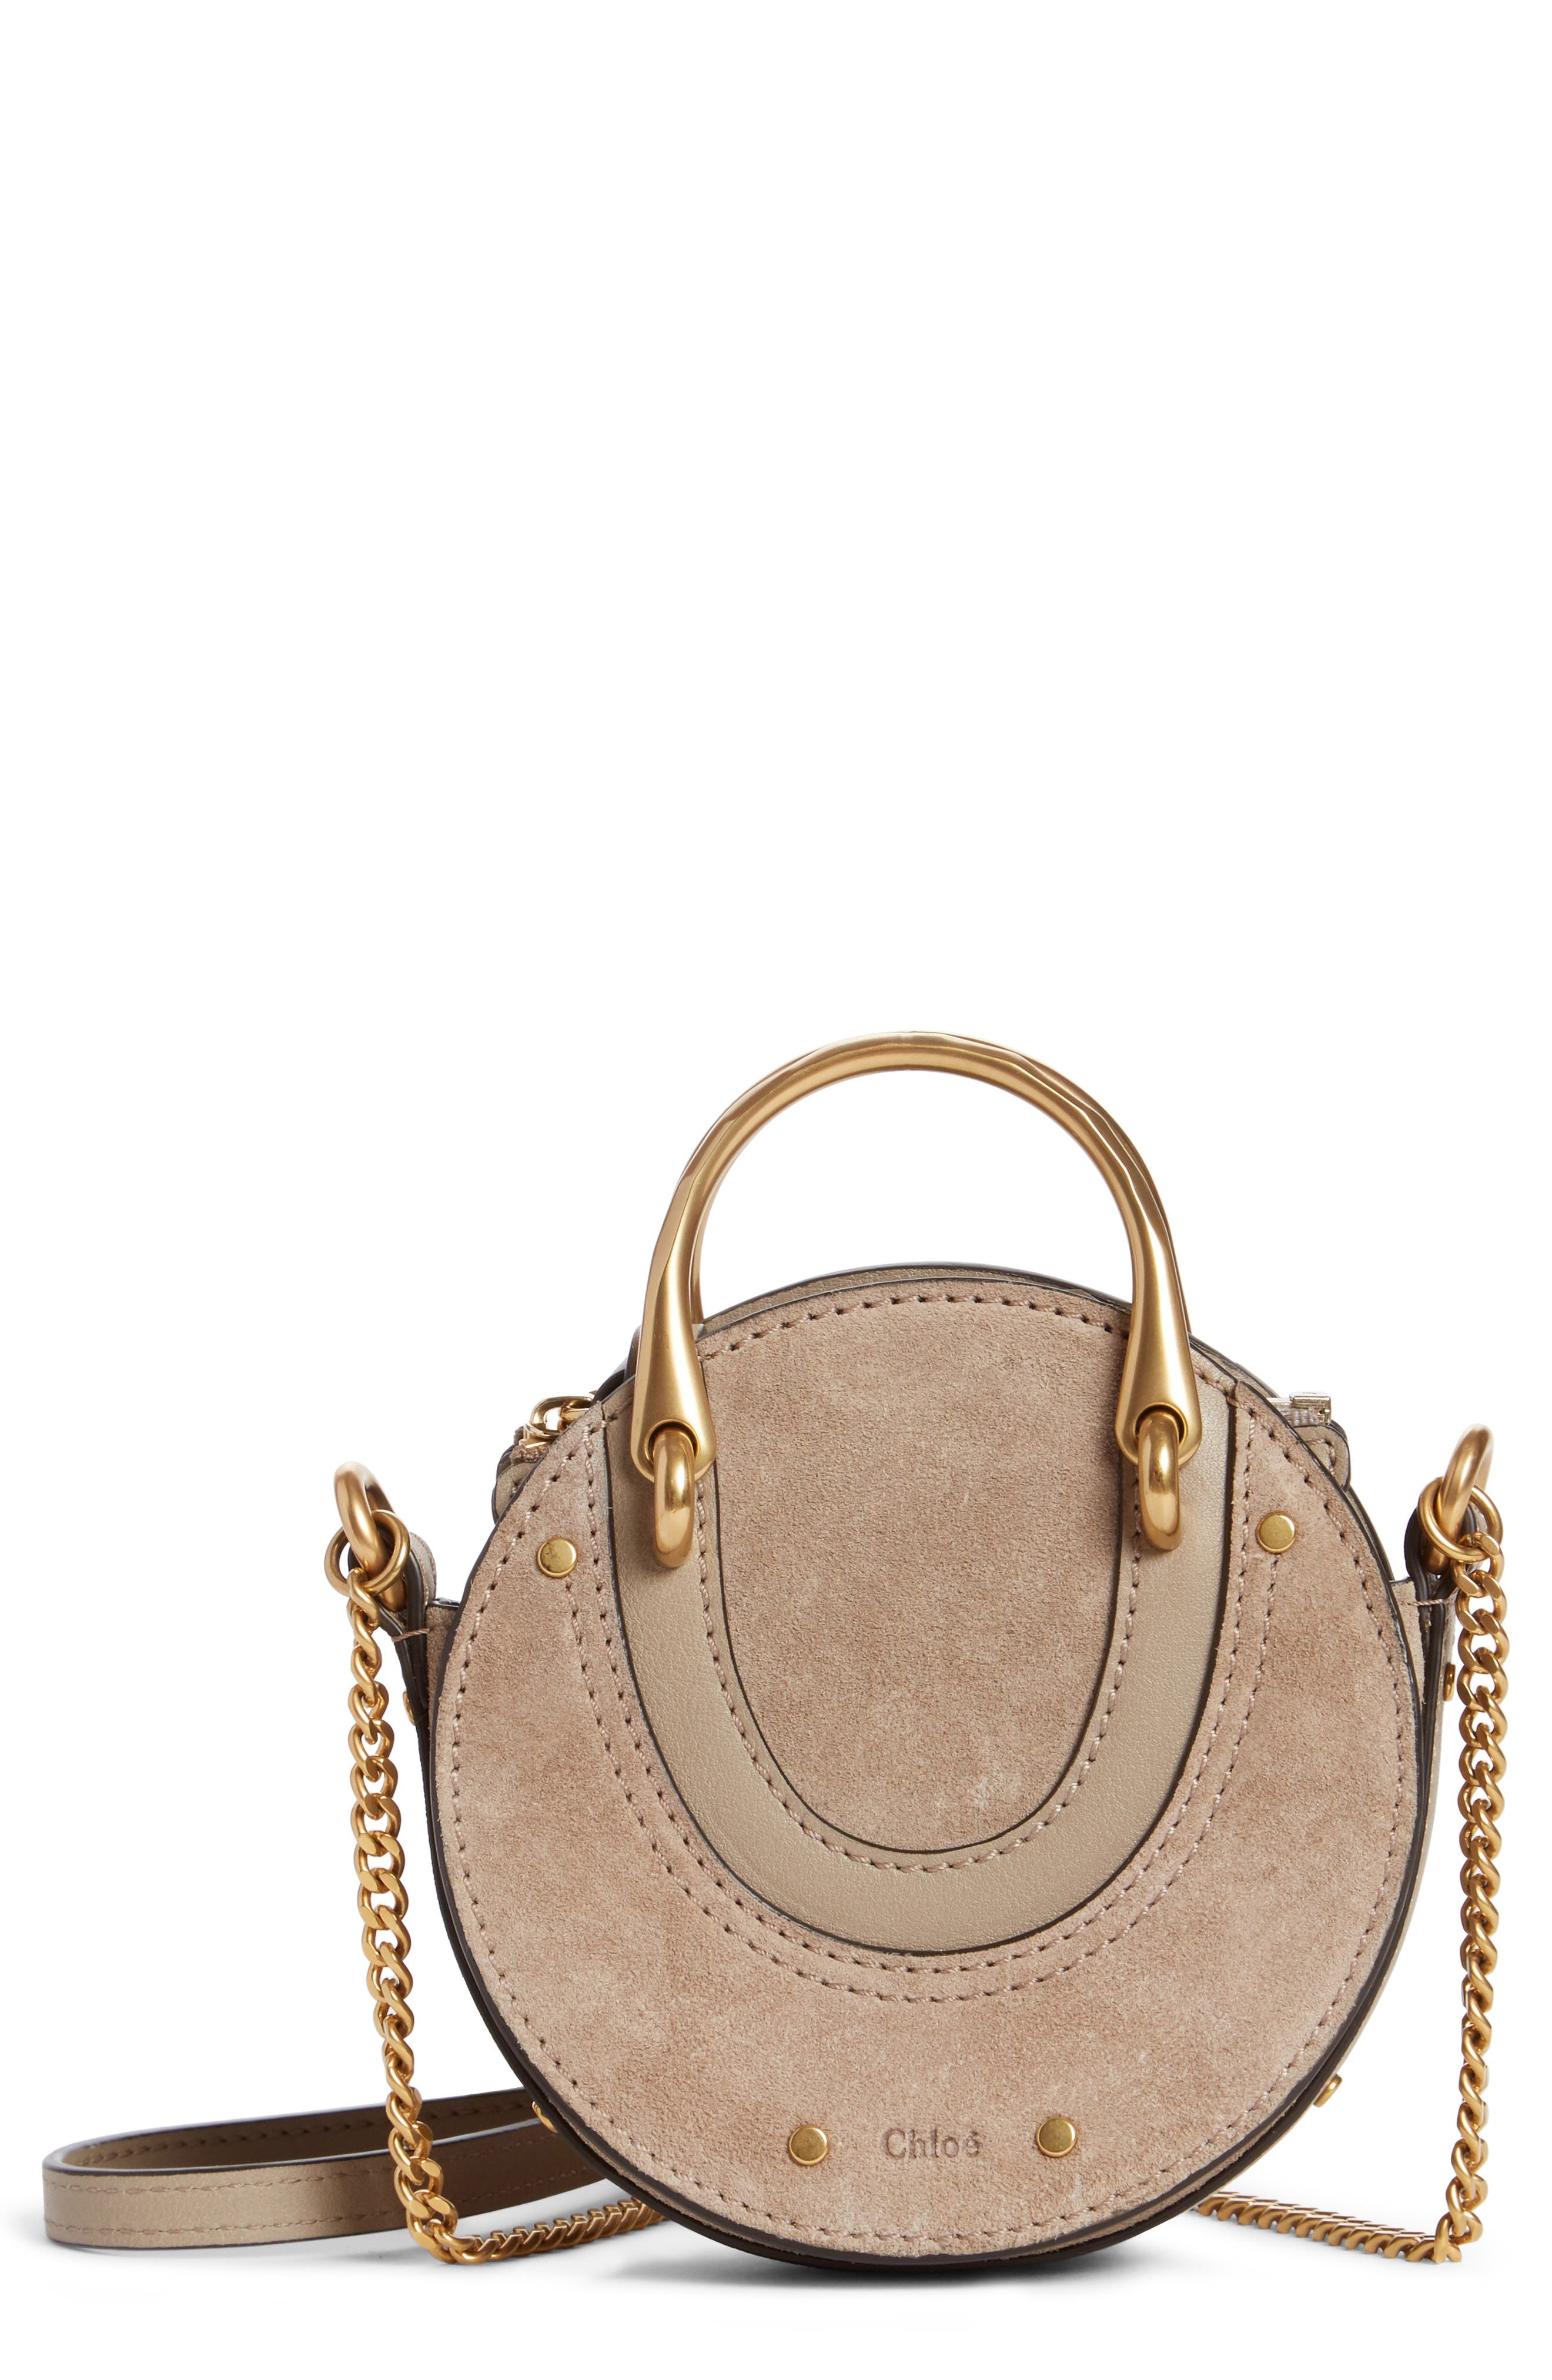 Nano Pixie Leather Crossbody Bag,                             Main thumbnail 1, color,                             250